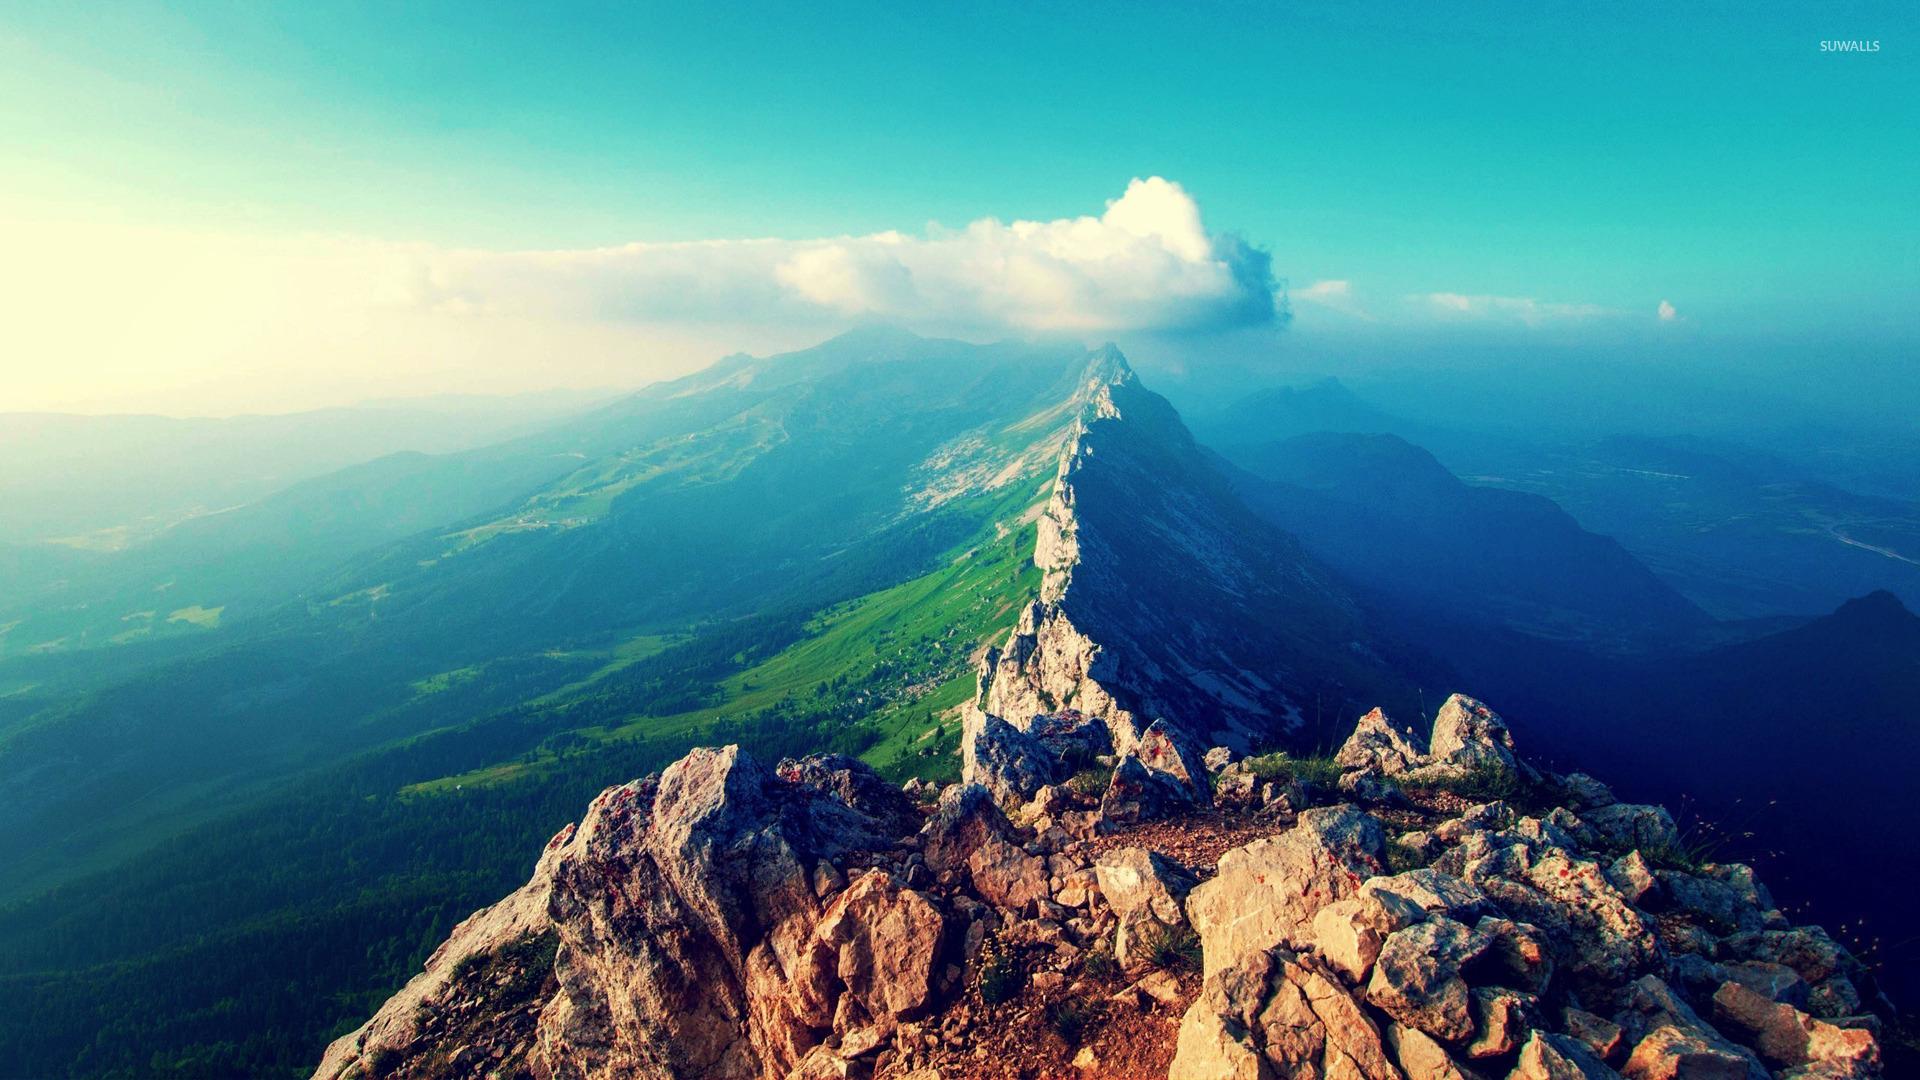 Wonderful Wallpaper Mountain 1440p - mountain-ridge-22394-1920x1080  Photograph_361213.jpg